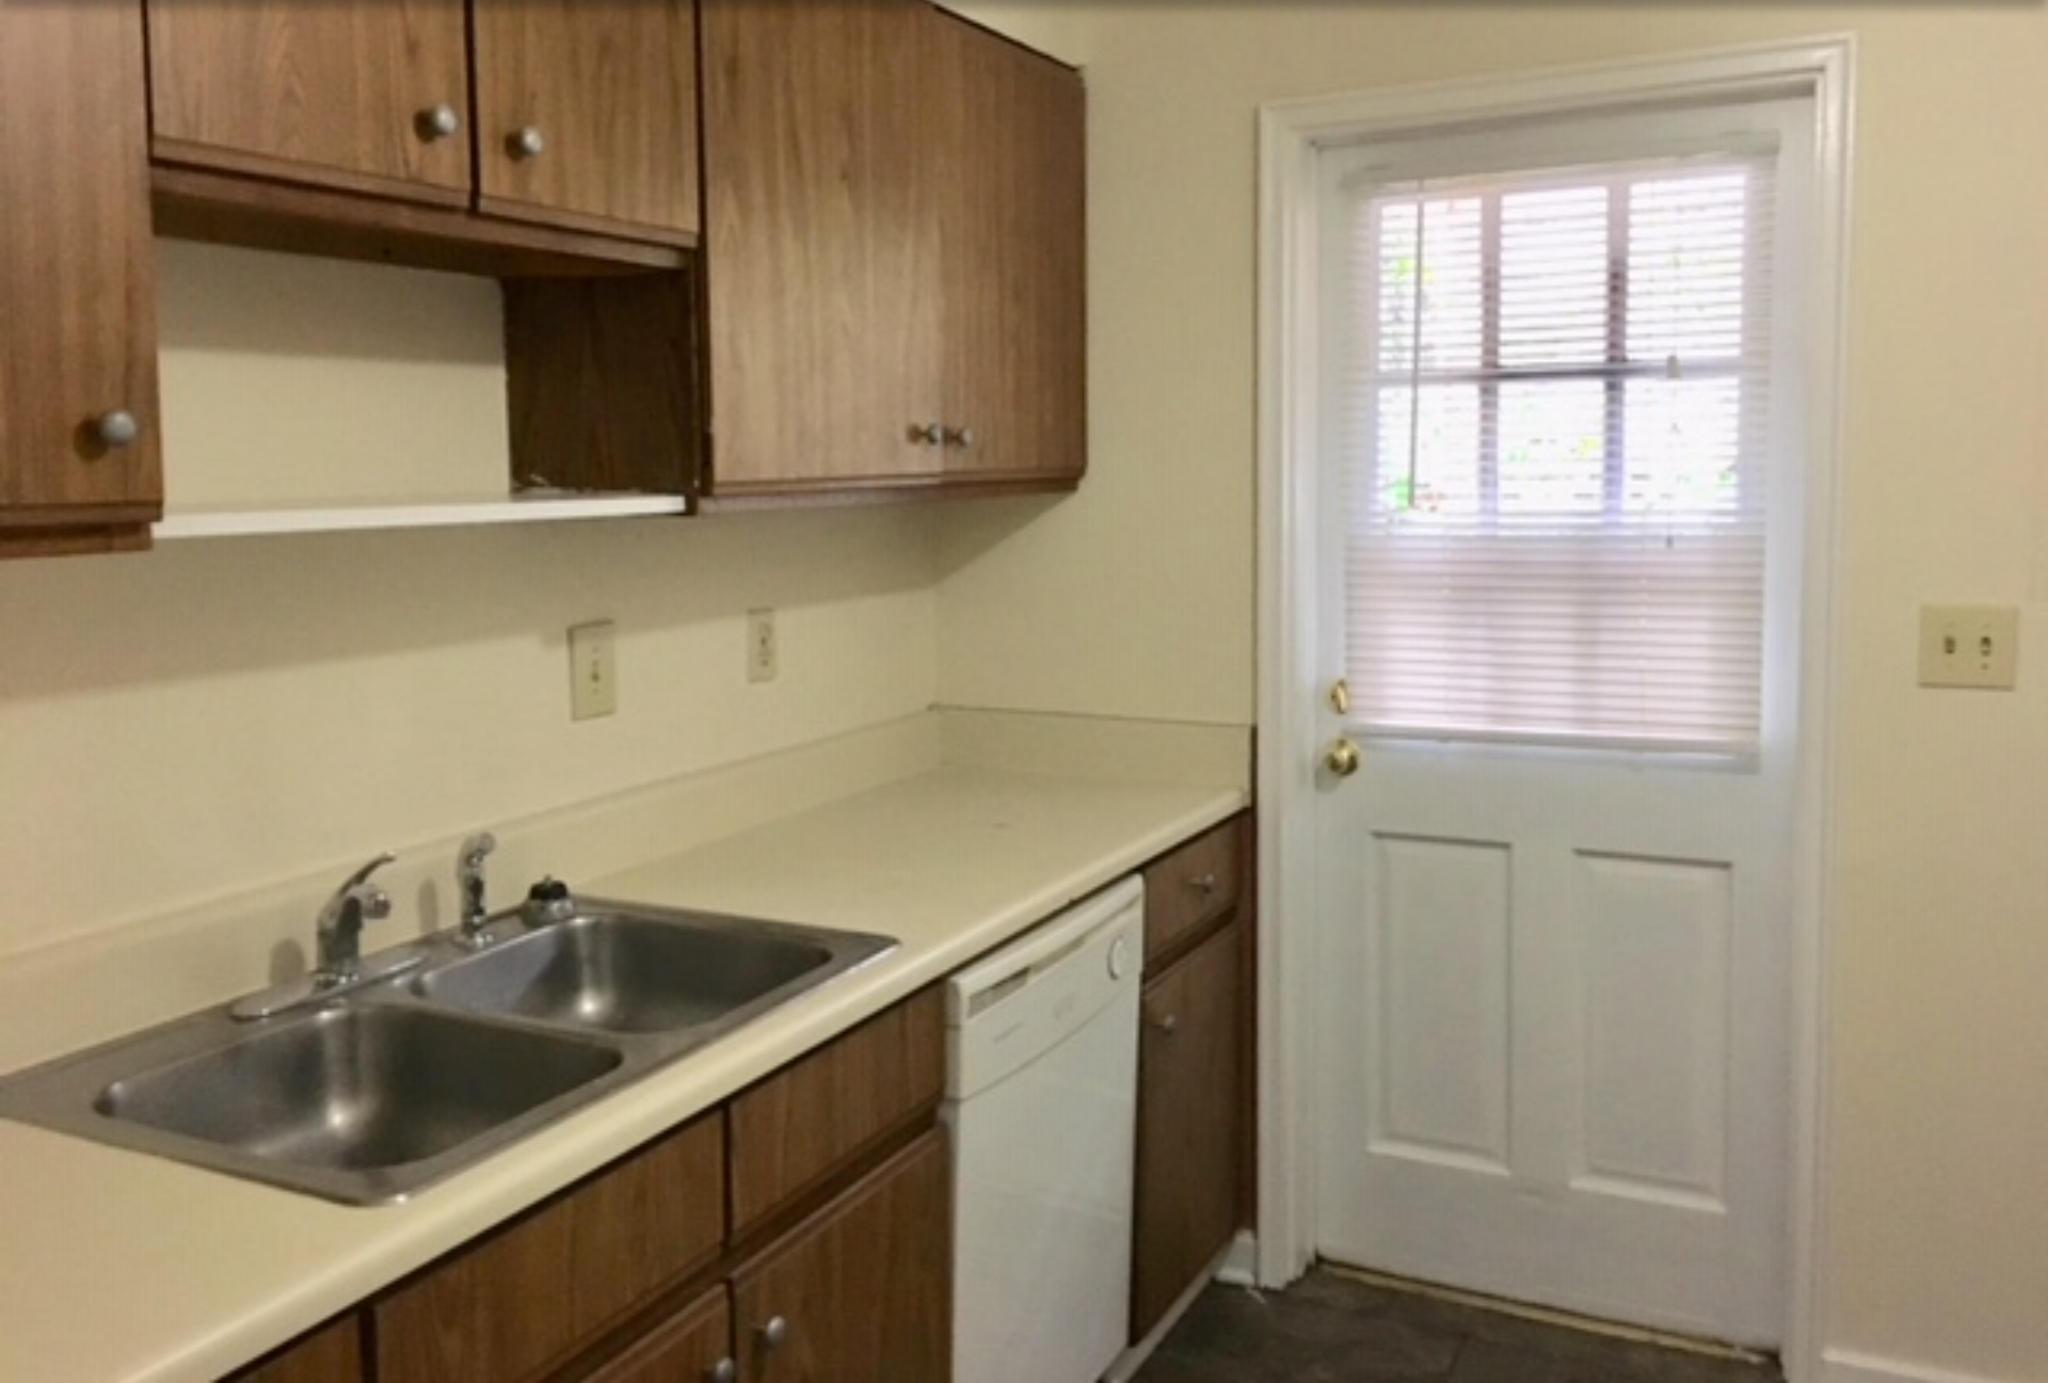 Rutledge Green Homes For Sale - 173 Rutledge Ave, Charleston, SC - 18